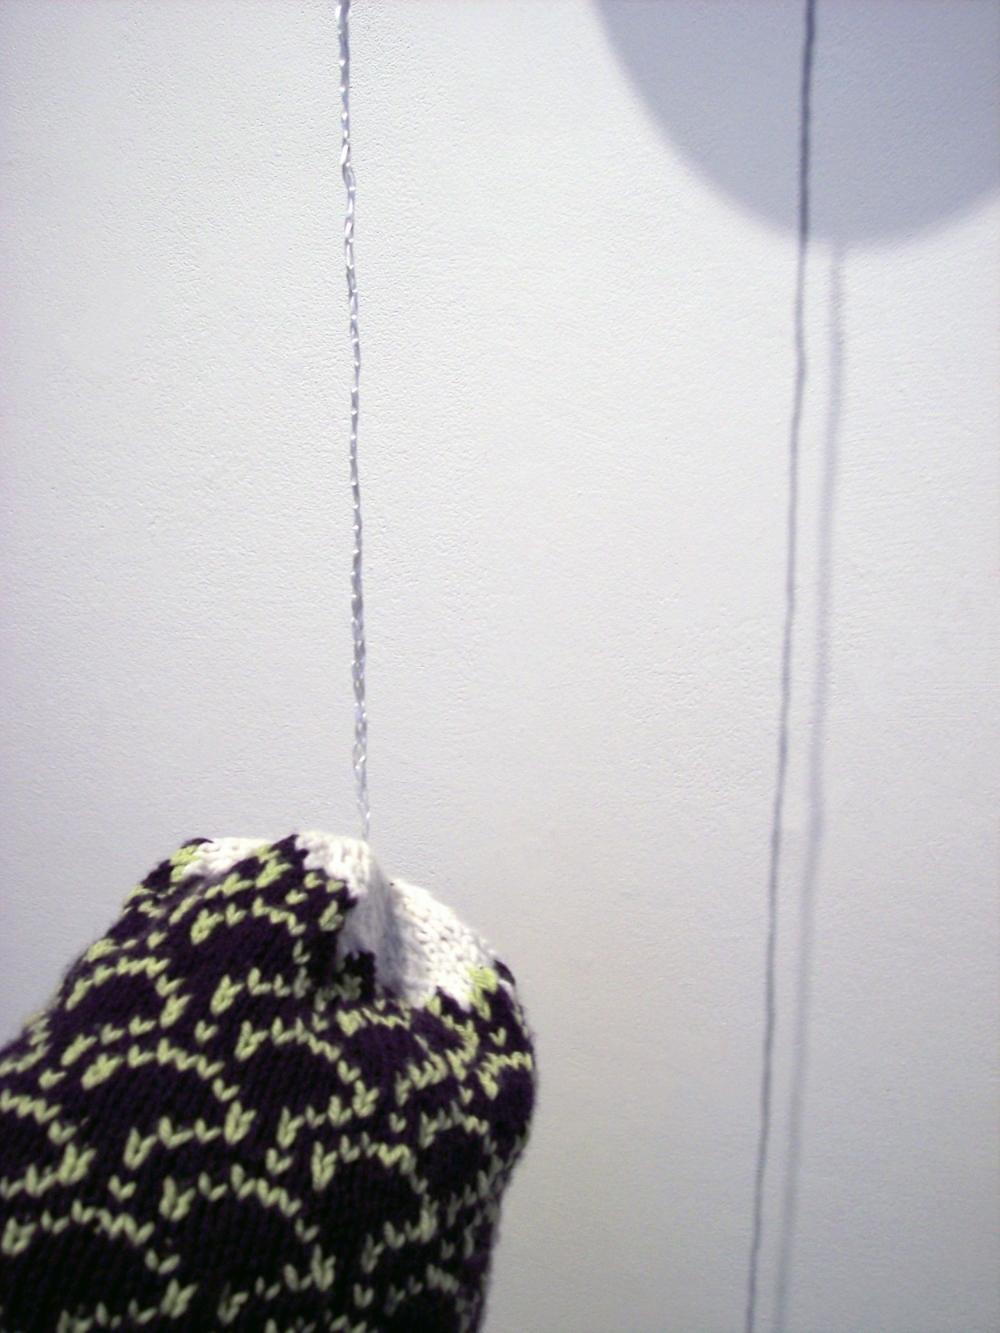 Thinking Cap (detail)